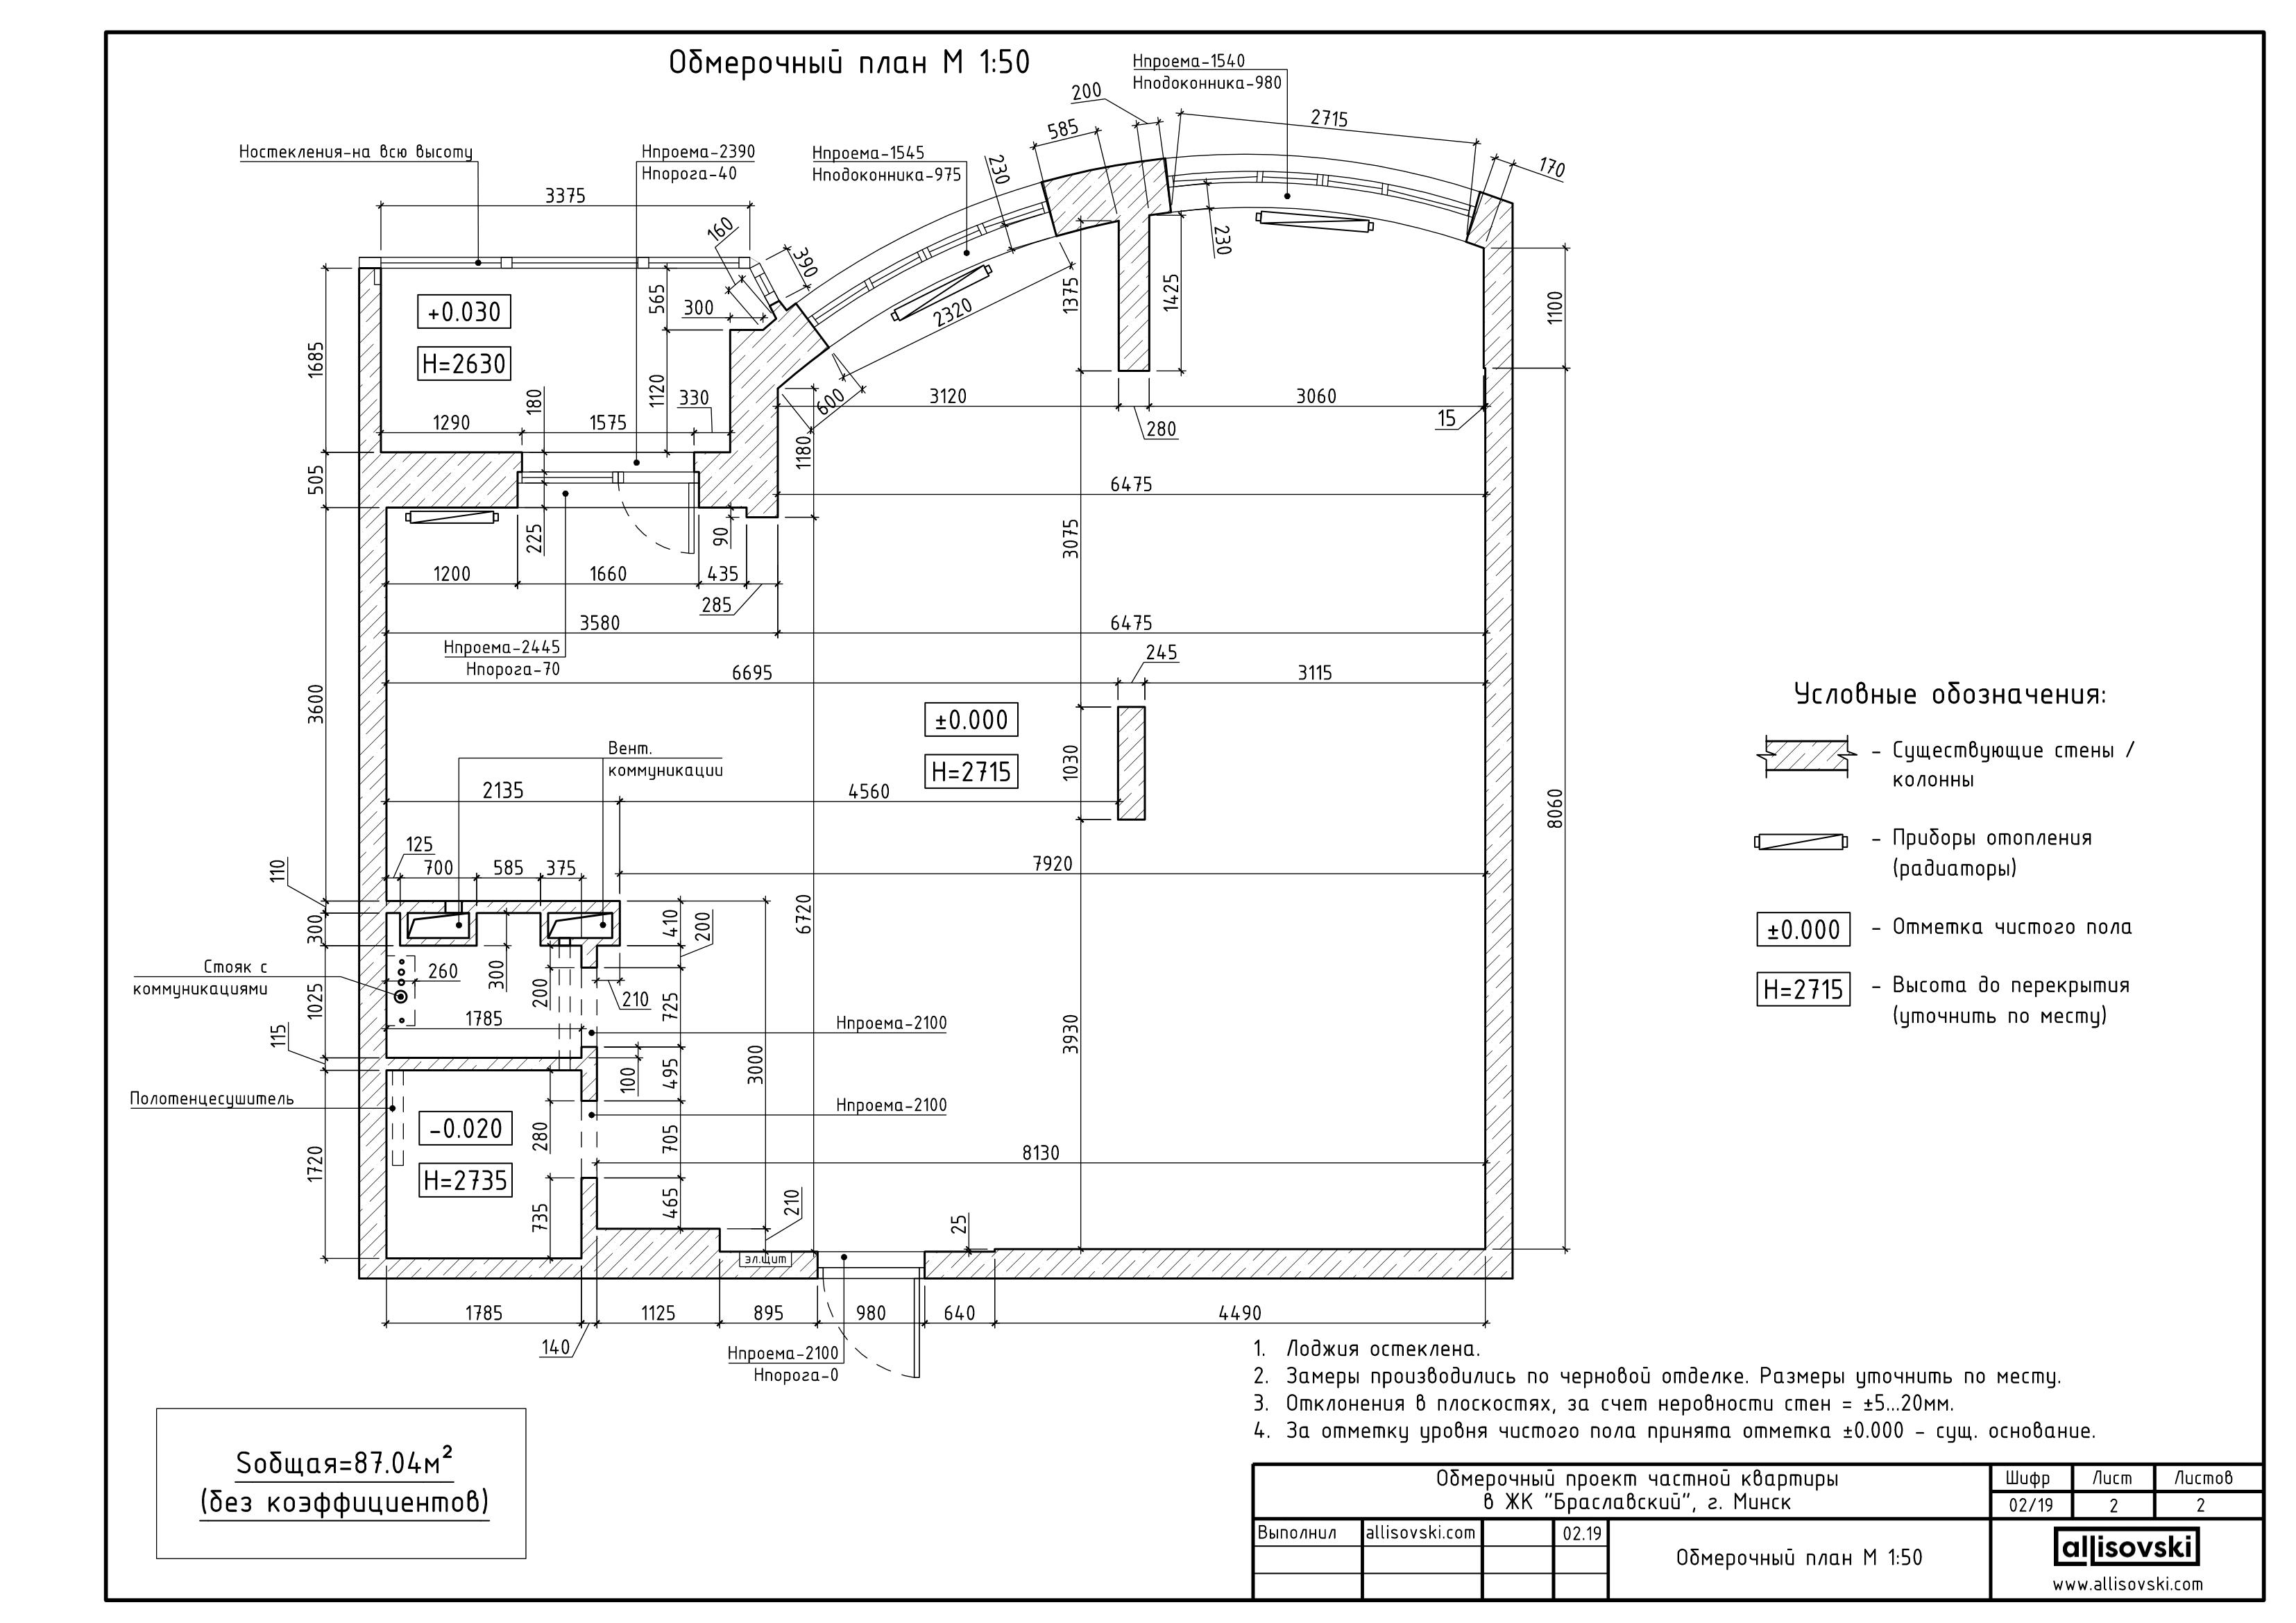 Обмерочный план квартиры Минск